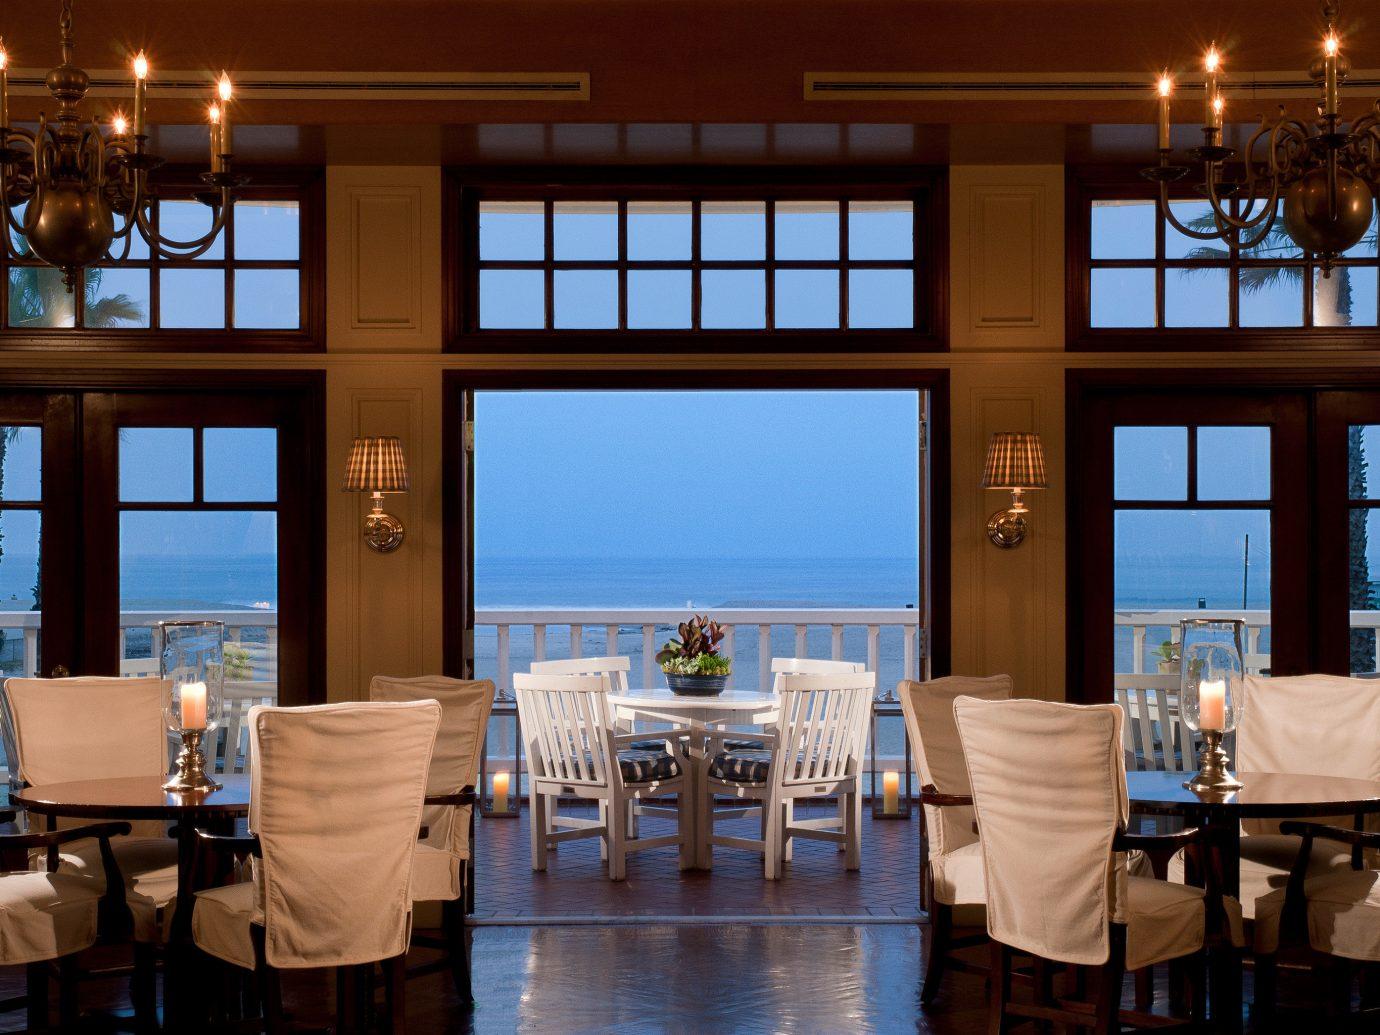 Bar Dining Drink Eat Hotels Luxury Modern indoor window floor ceiling restaurant estate Resort home interior design Design overlooking Island several dining room